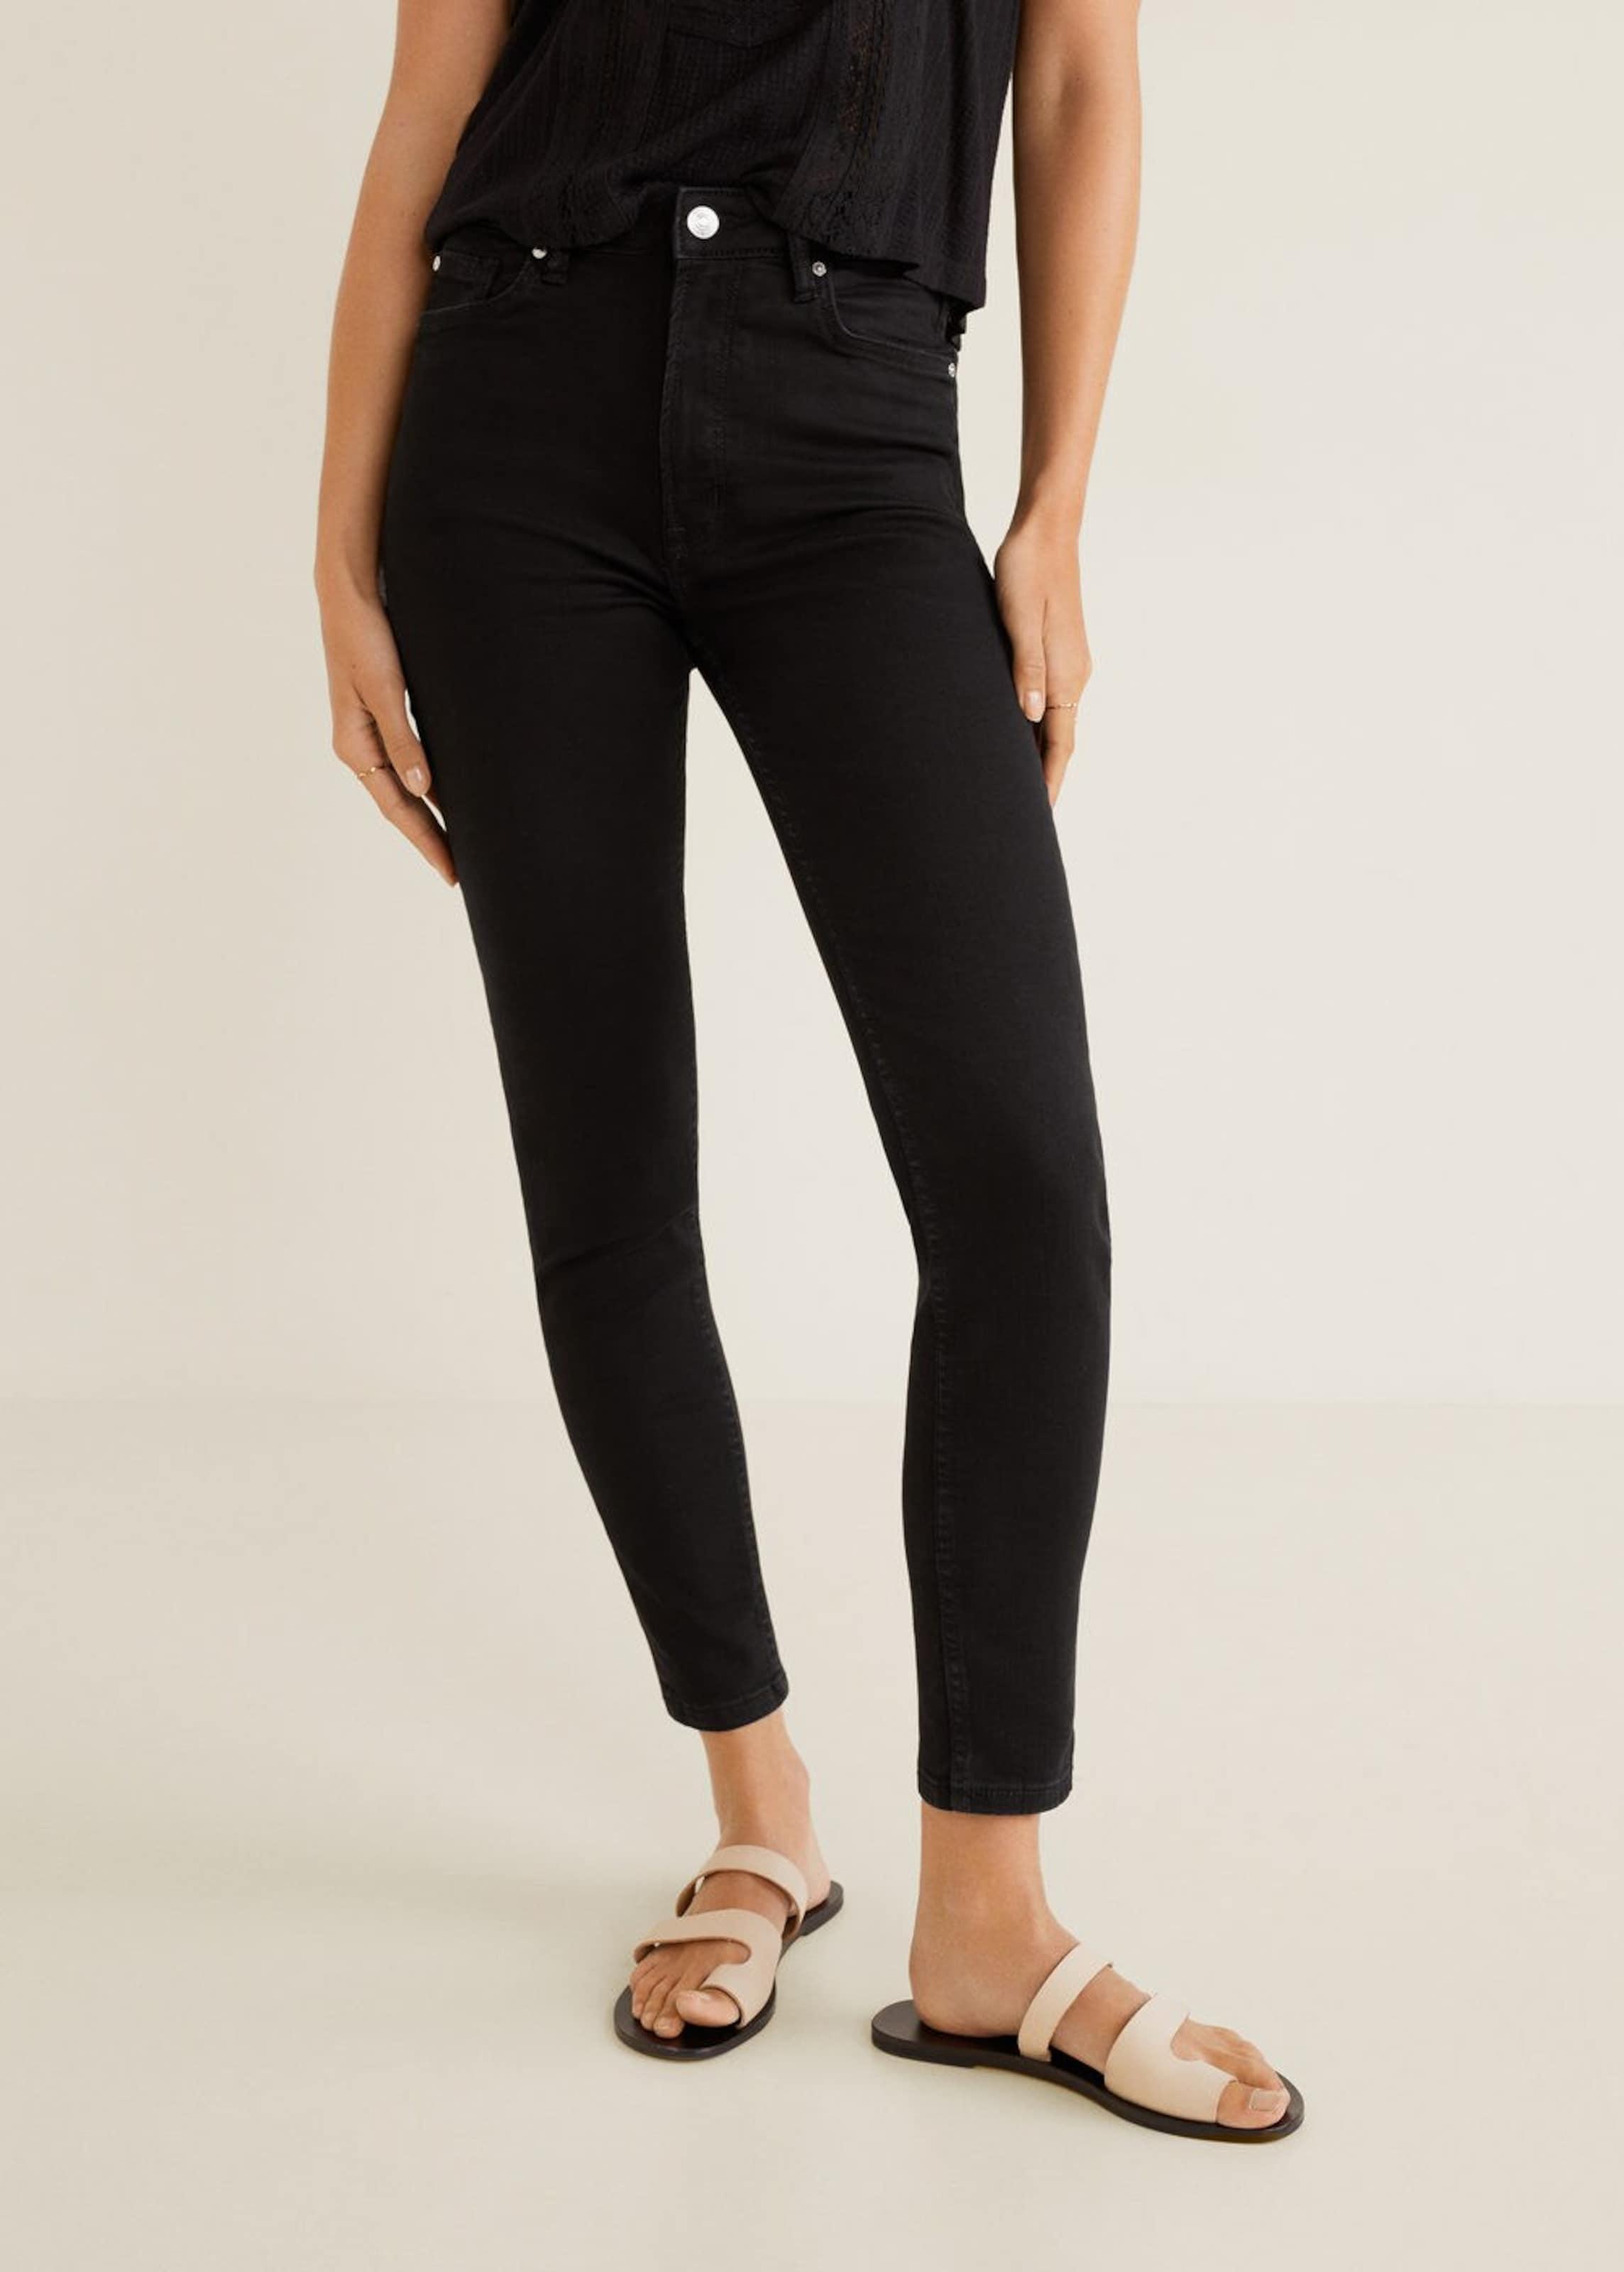 In 'noa' Jeans Denim Black Mango 0kP8wnO